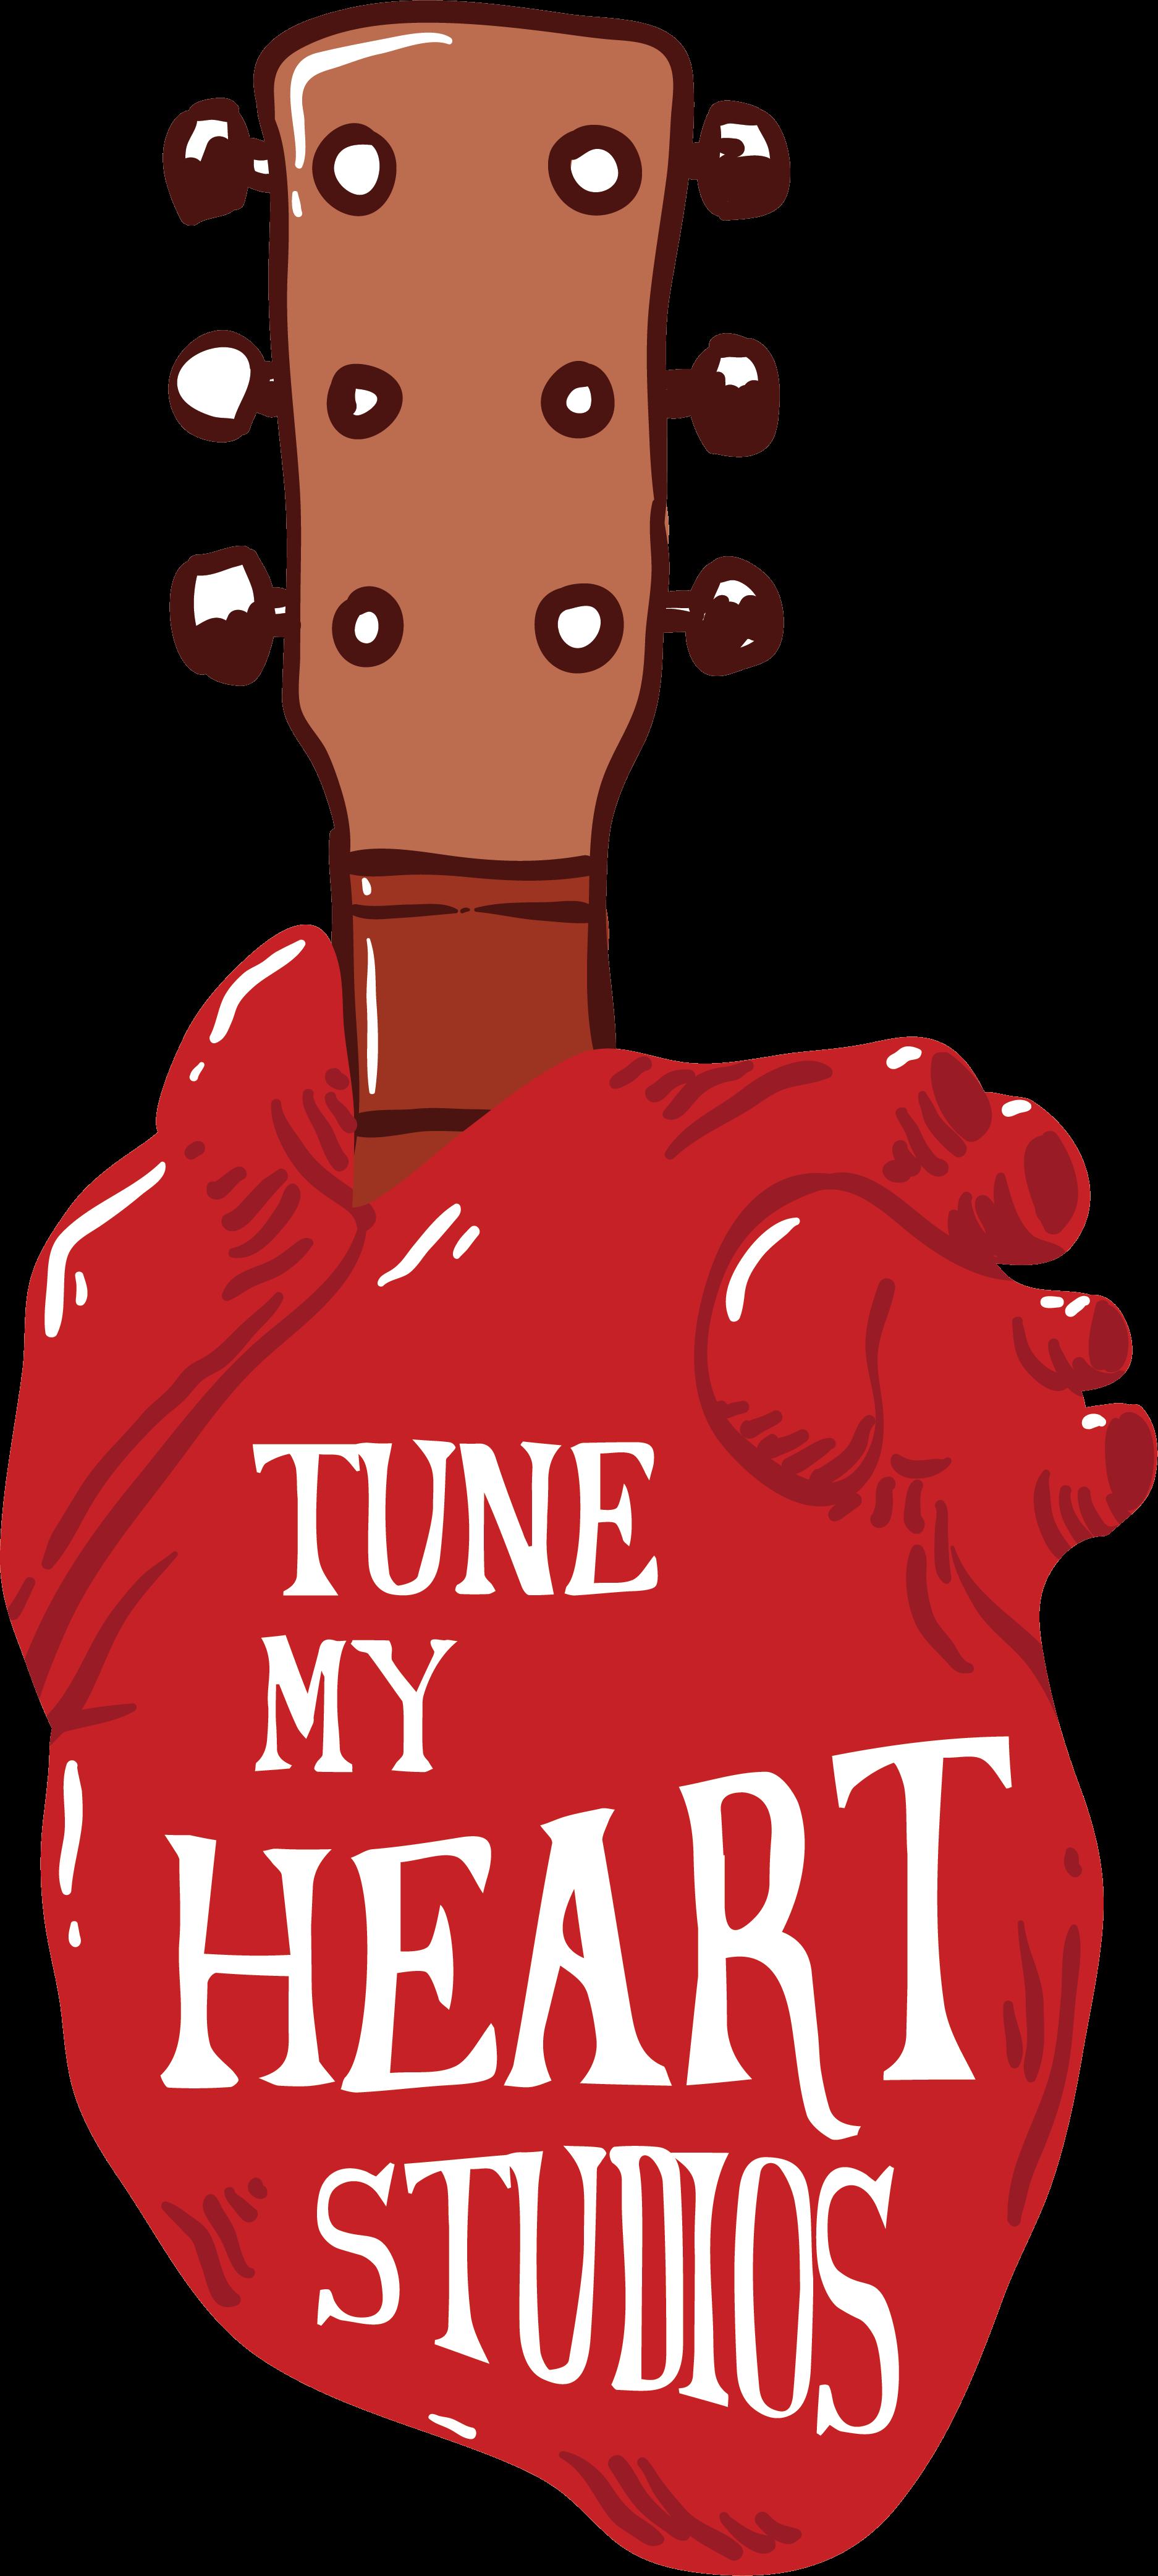 Tune My Heart Studios